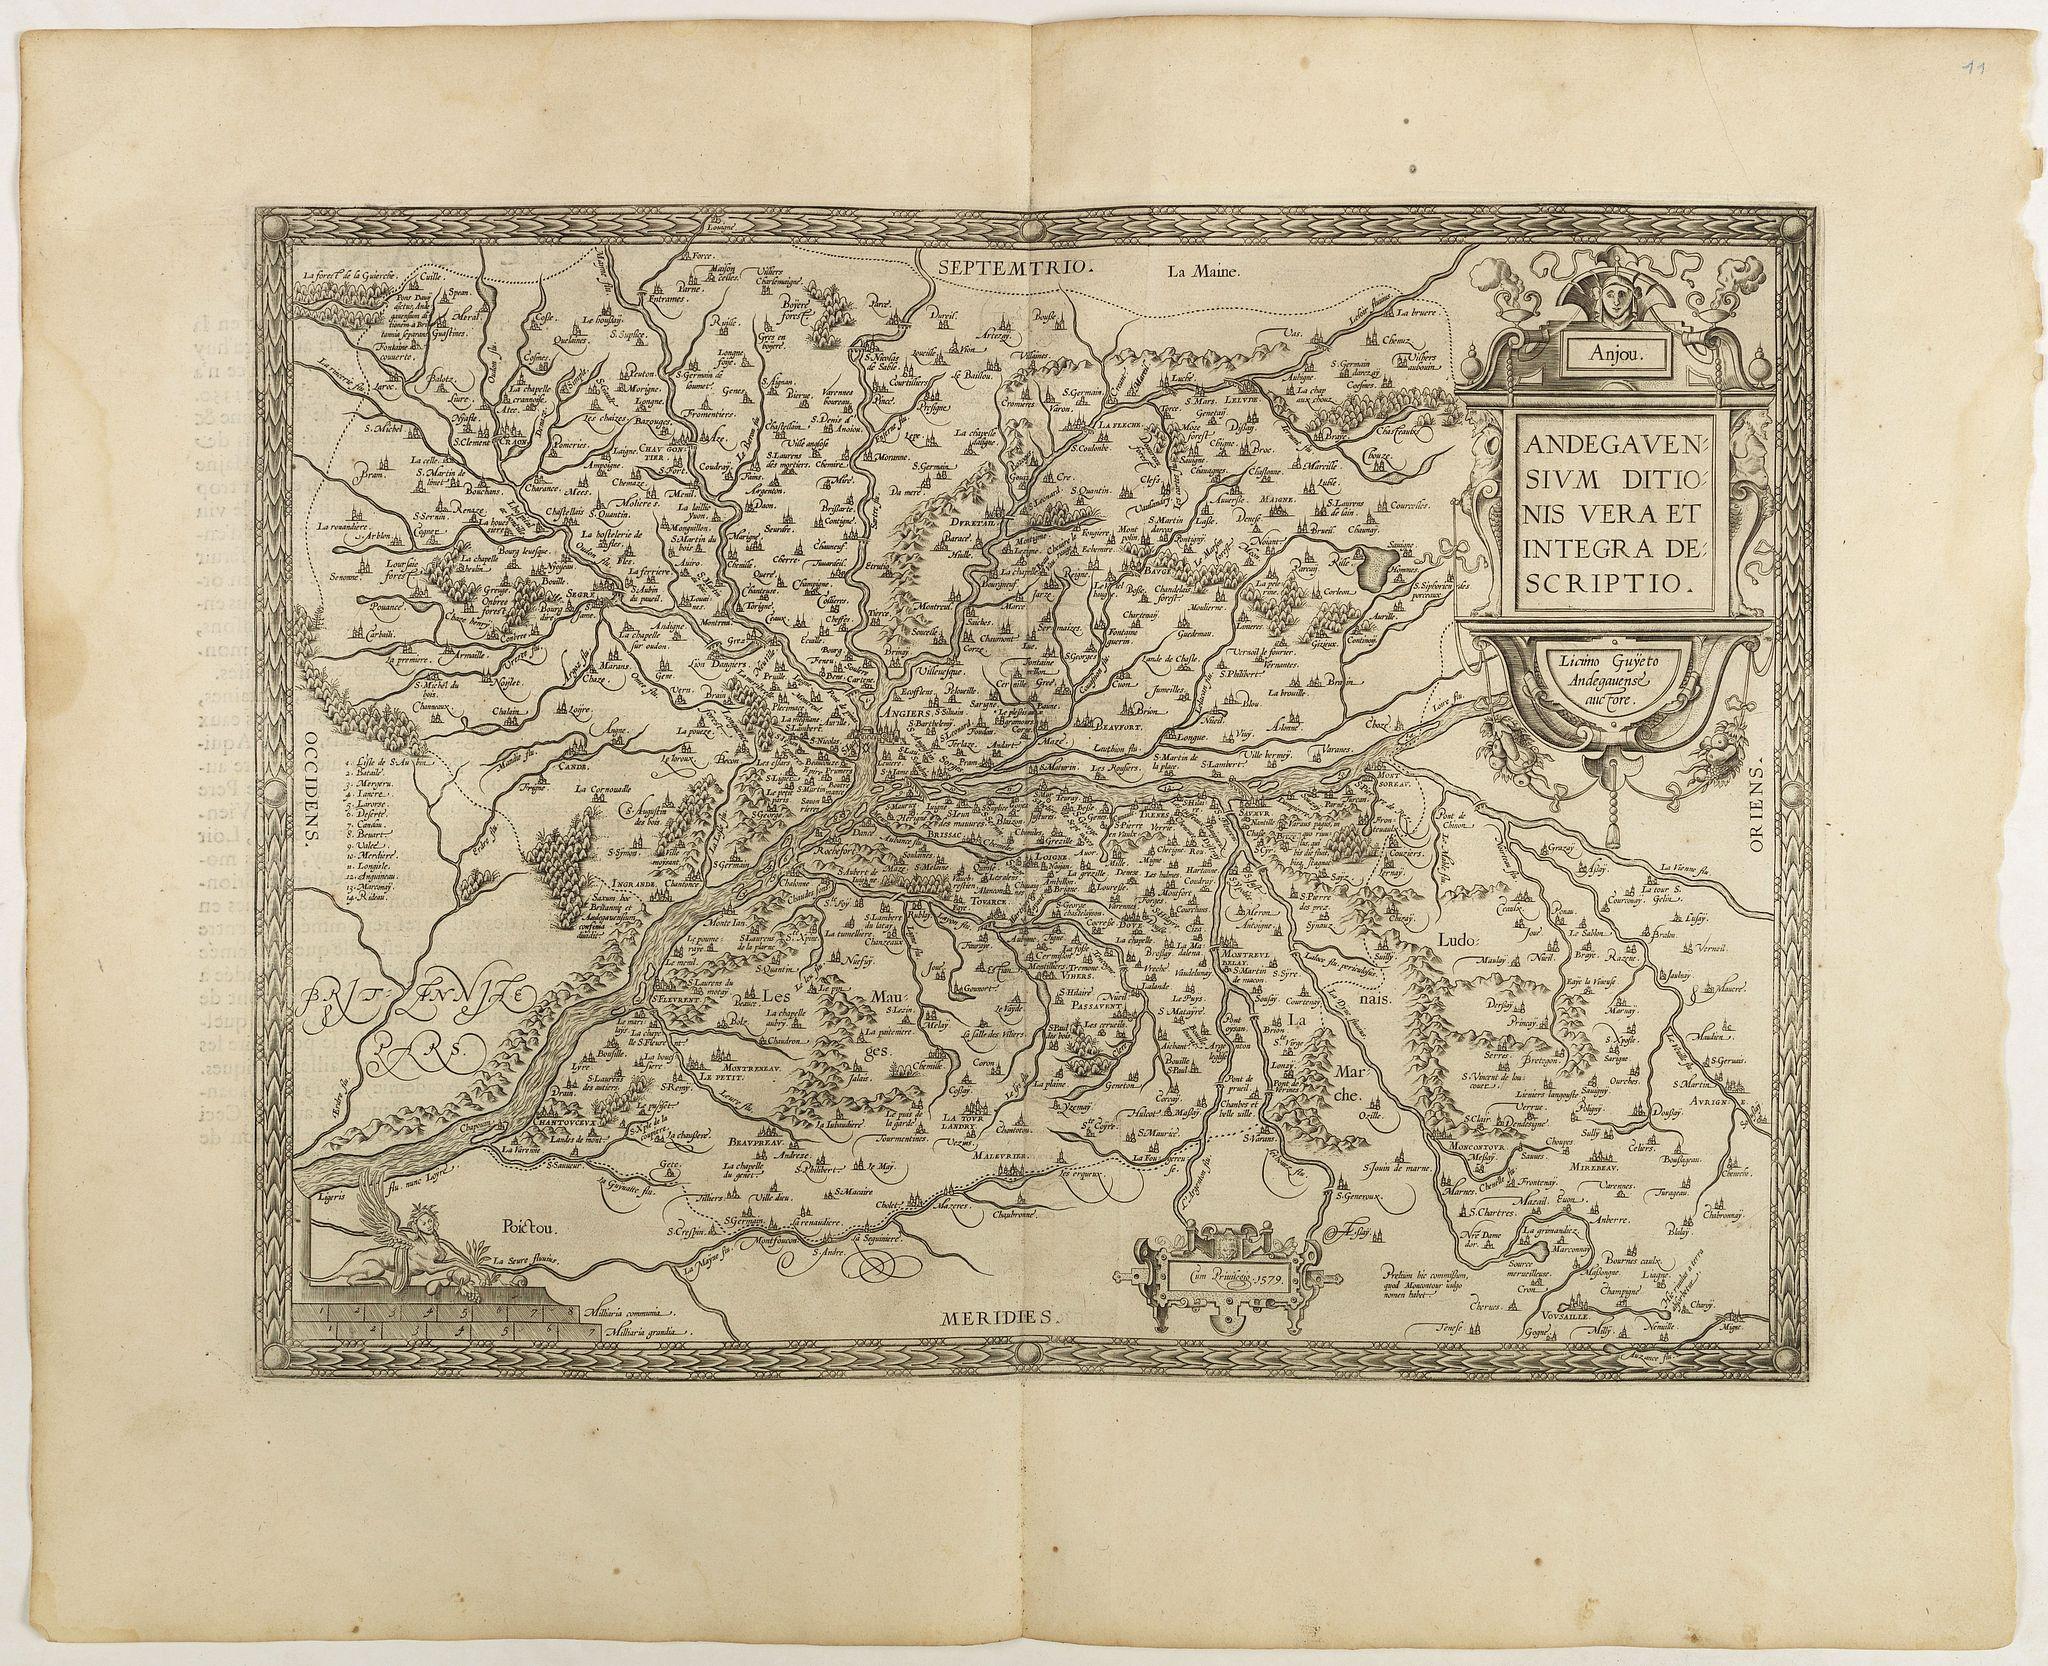 ORTELIUS, A. -  Anjou. Andegavensium Ditionis Vera et  Integra Descriptio. Licimo Guijeto Andegavense auctore.